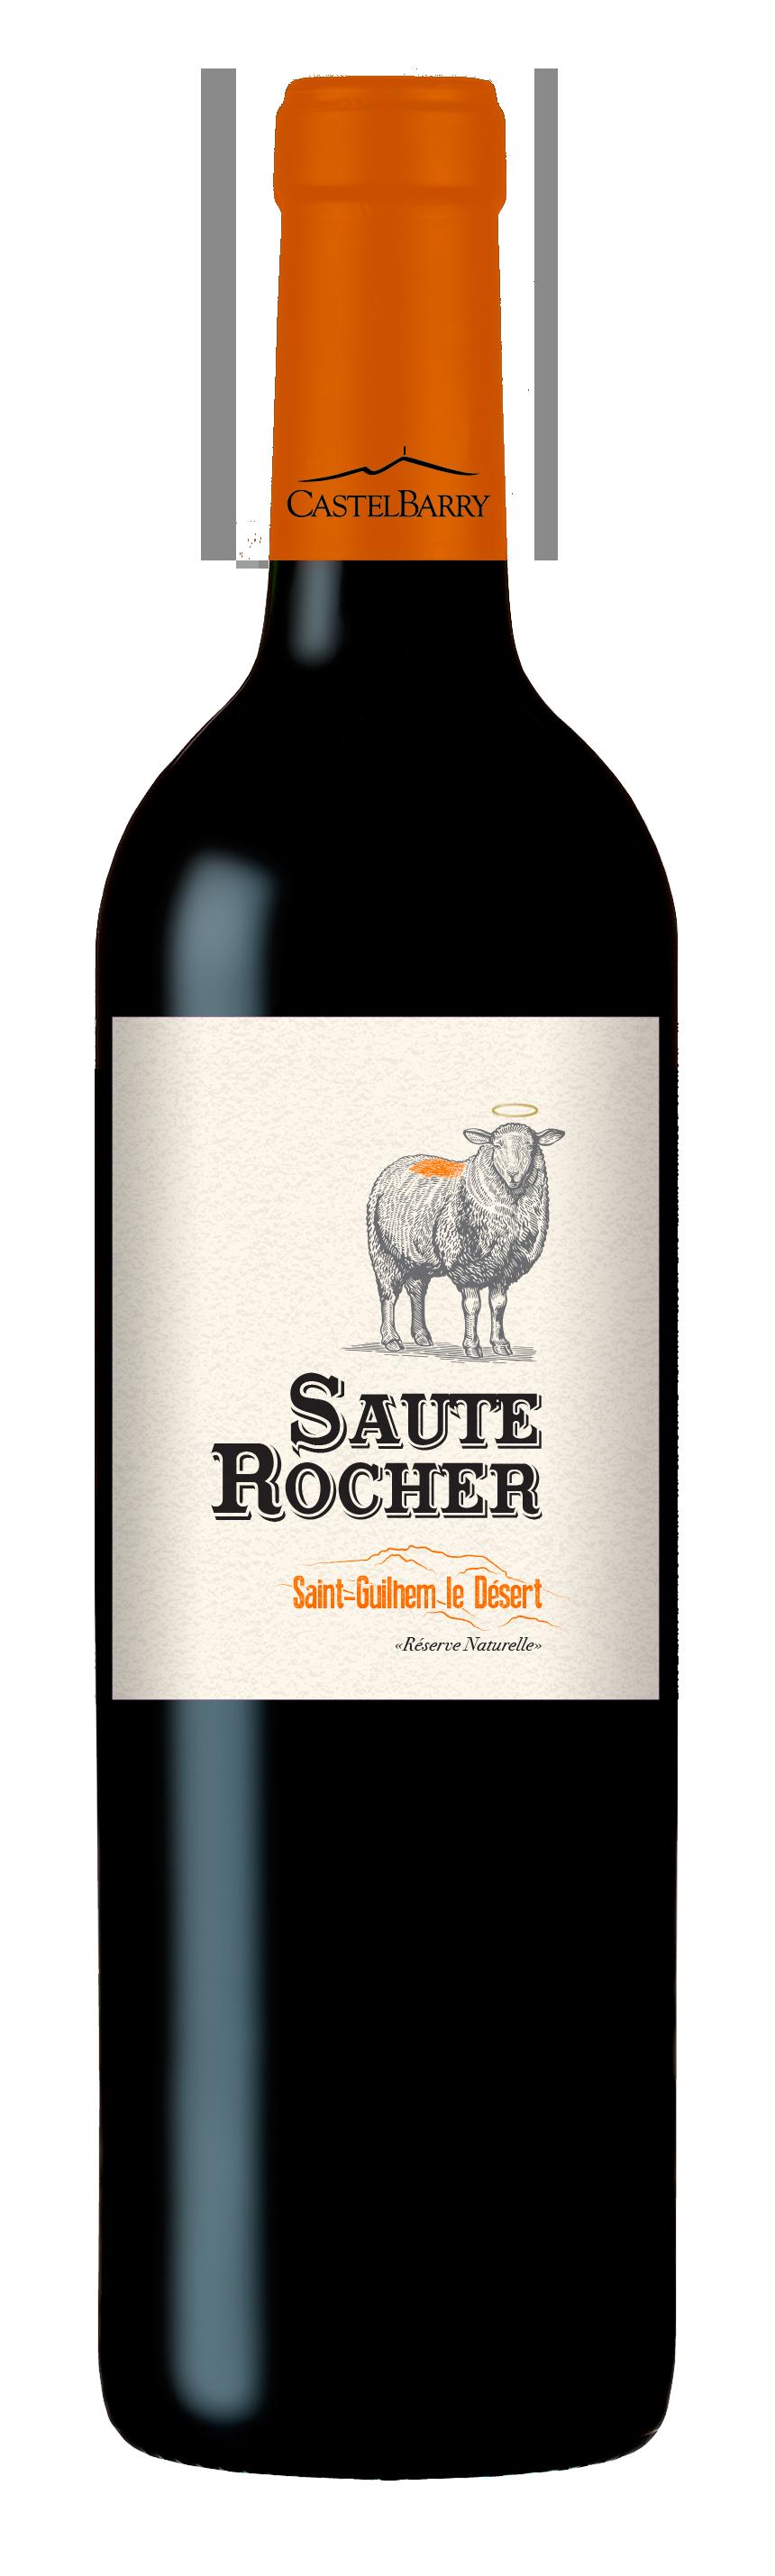 Saute Rocher Marselan-Syrah-Merlot